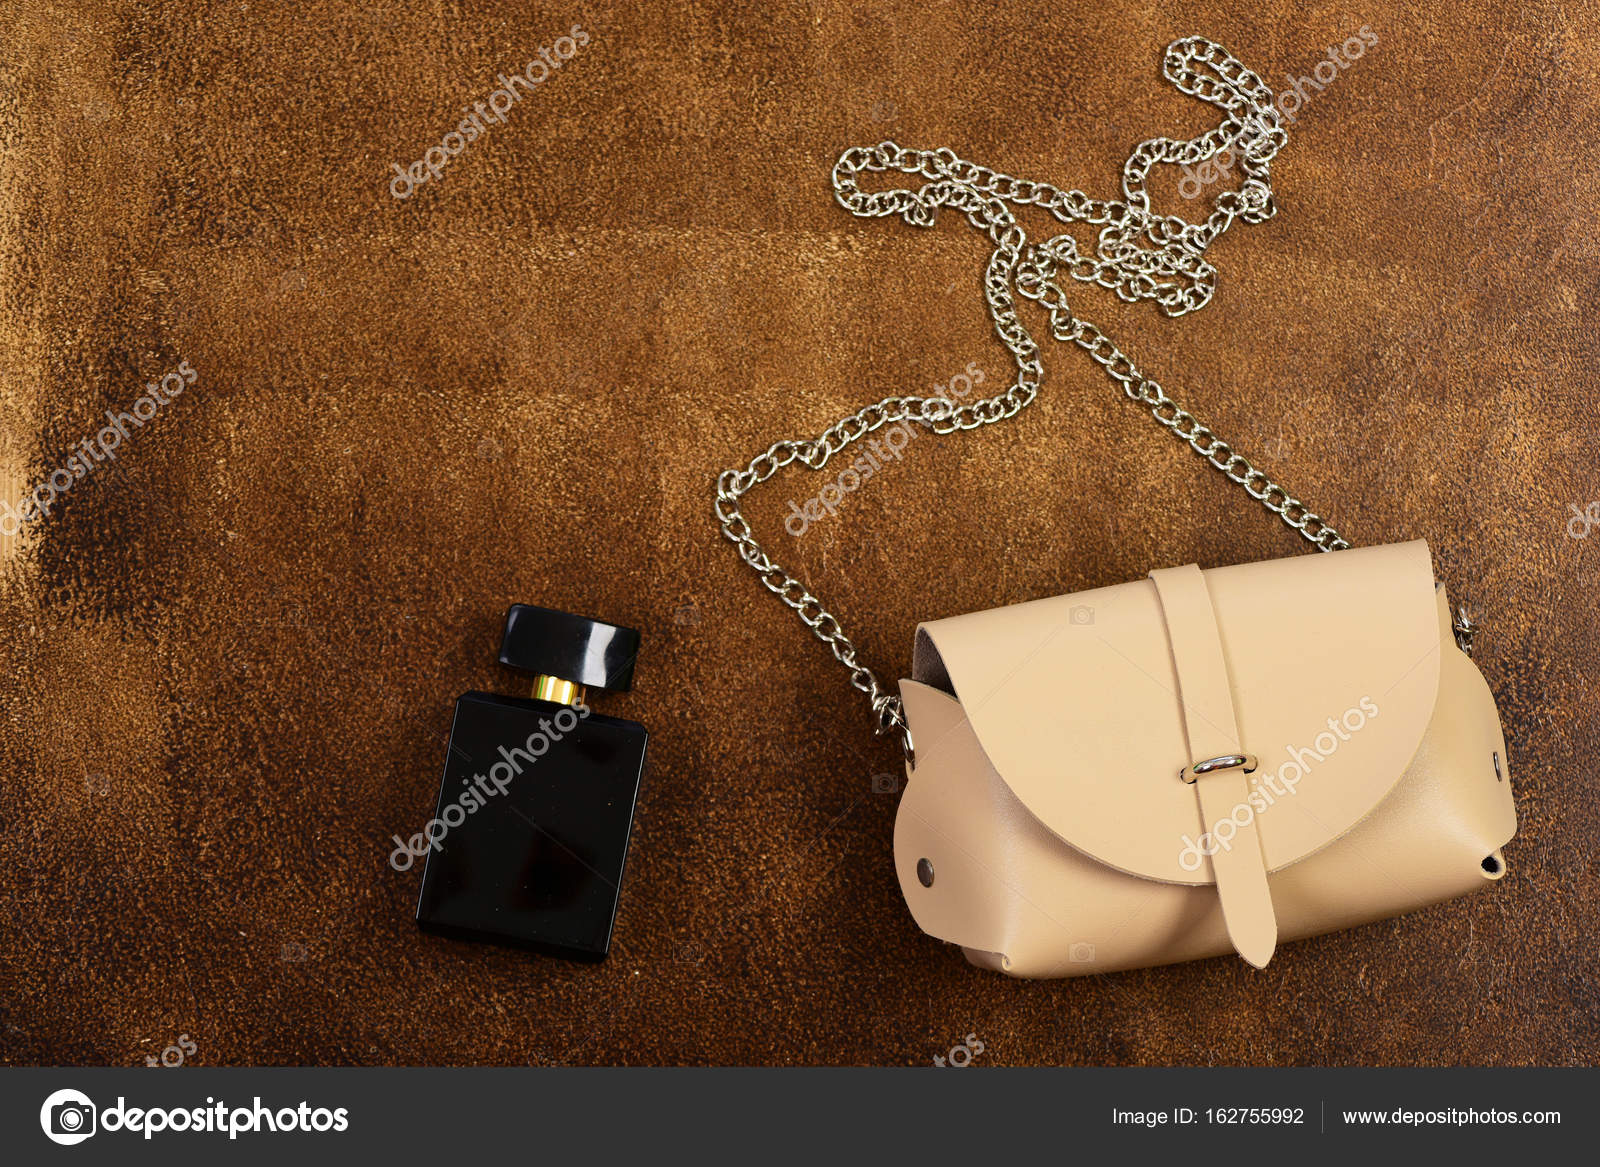 119f6b7d03 Μπεζ τσάντα με μεγάλη μεταλλική αλυσίδα. Μόδα και άρωμα έννοια. Δερμάτινο  τσαντάκι και Άρωμα μπουκάλι σε φόντο καφέ σουέτ. Γυναικεία αξεσουάρ